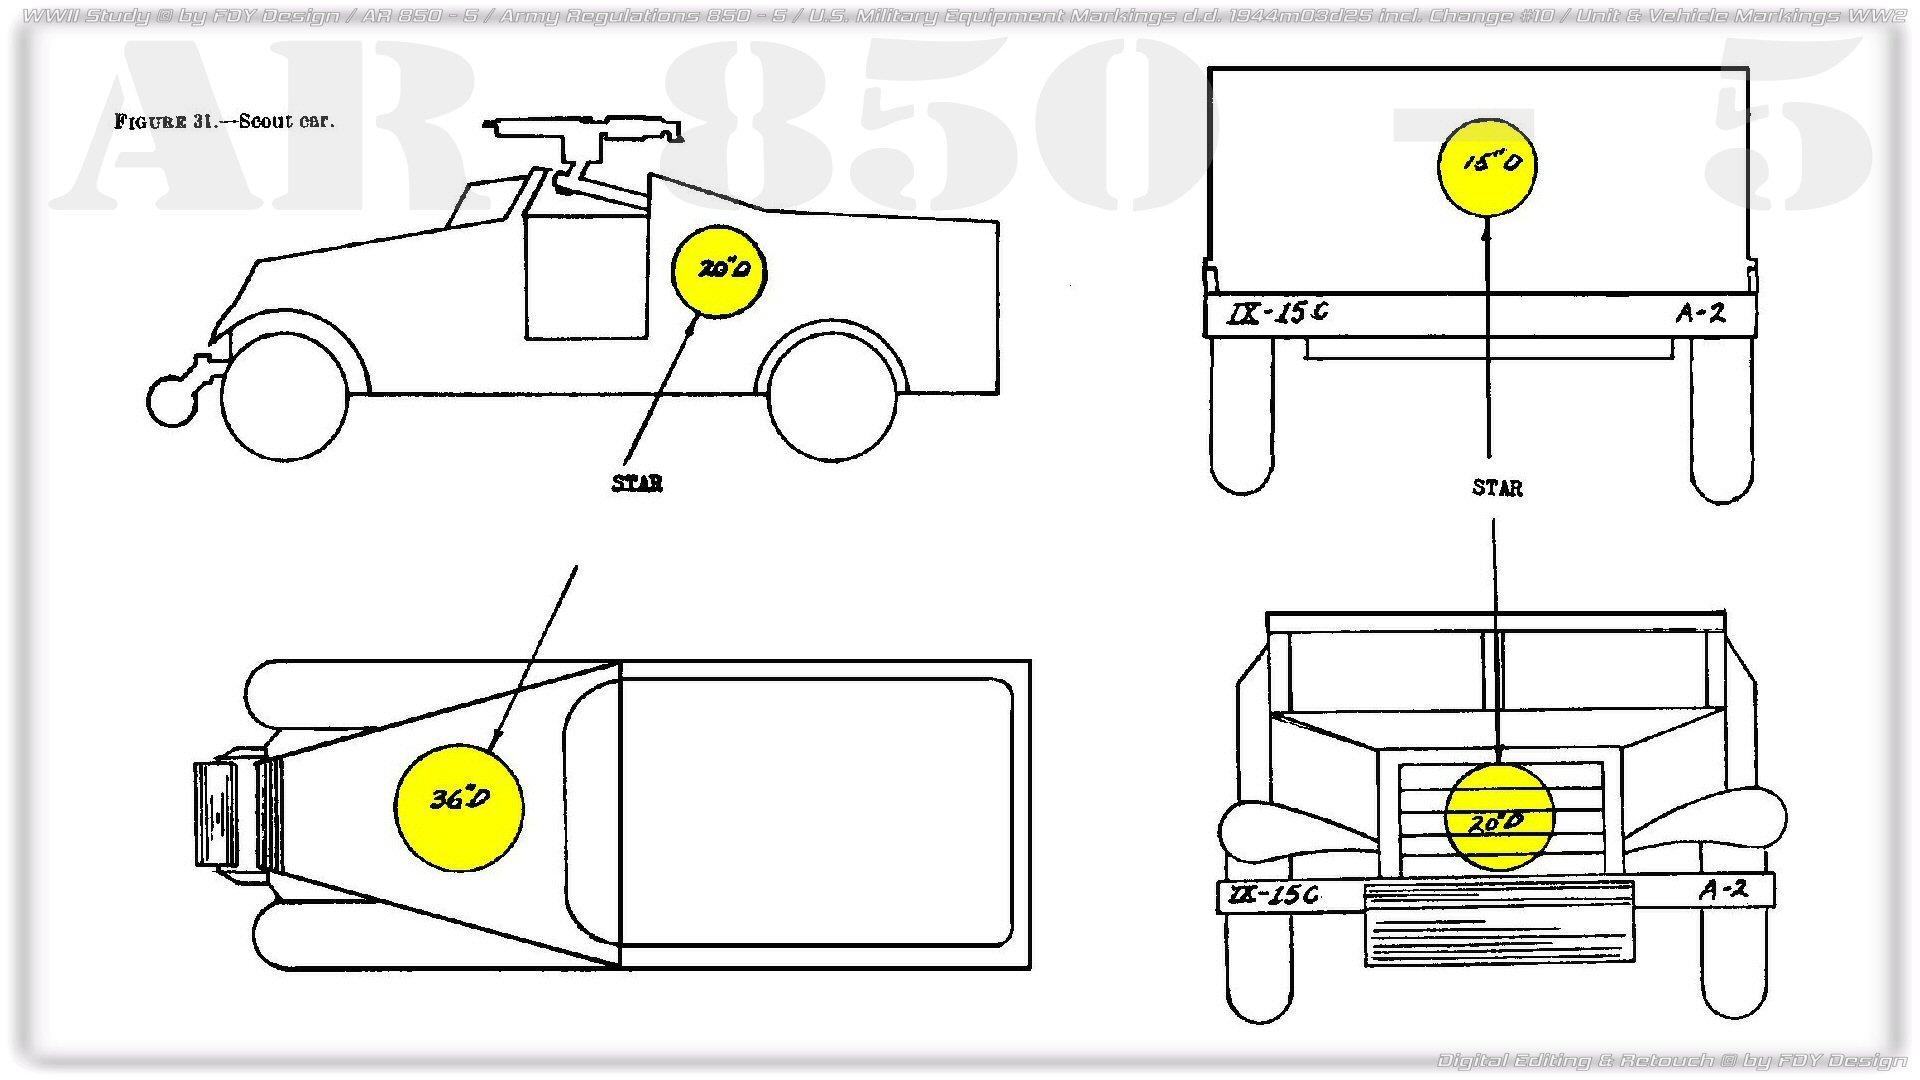 2004 porsche cayenne radio wiring diagram piaa fog lights 2002 boxster fuse box source